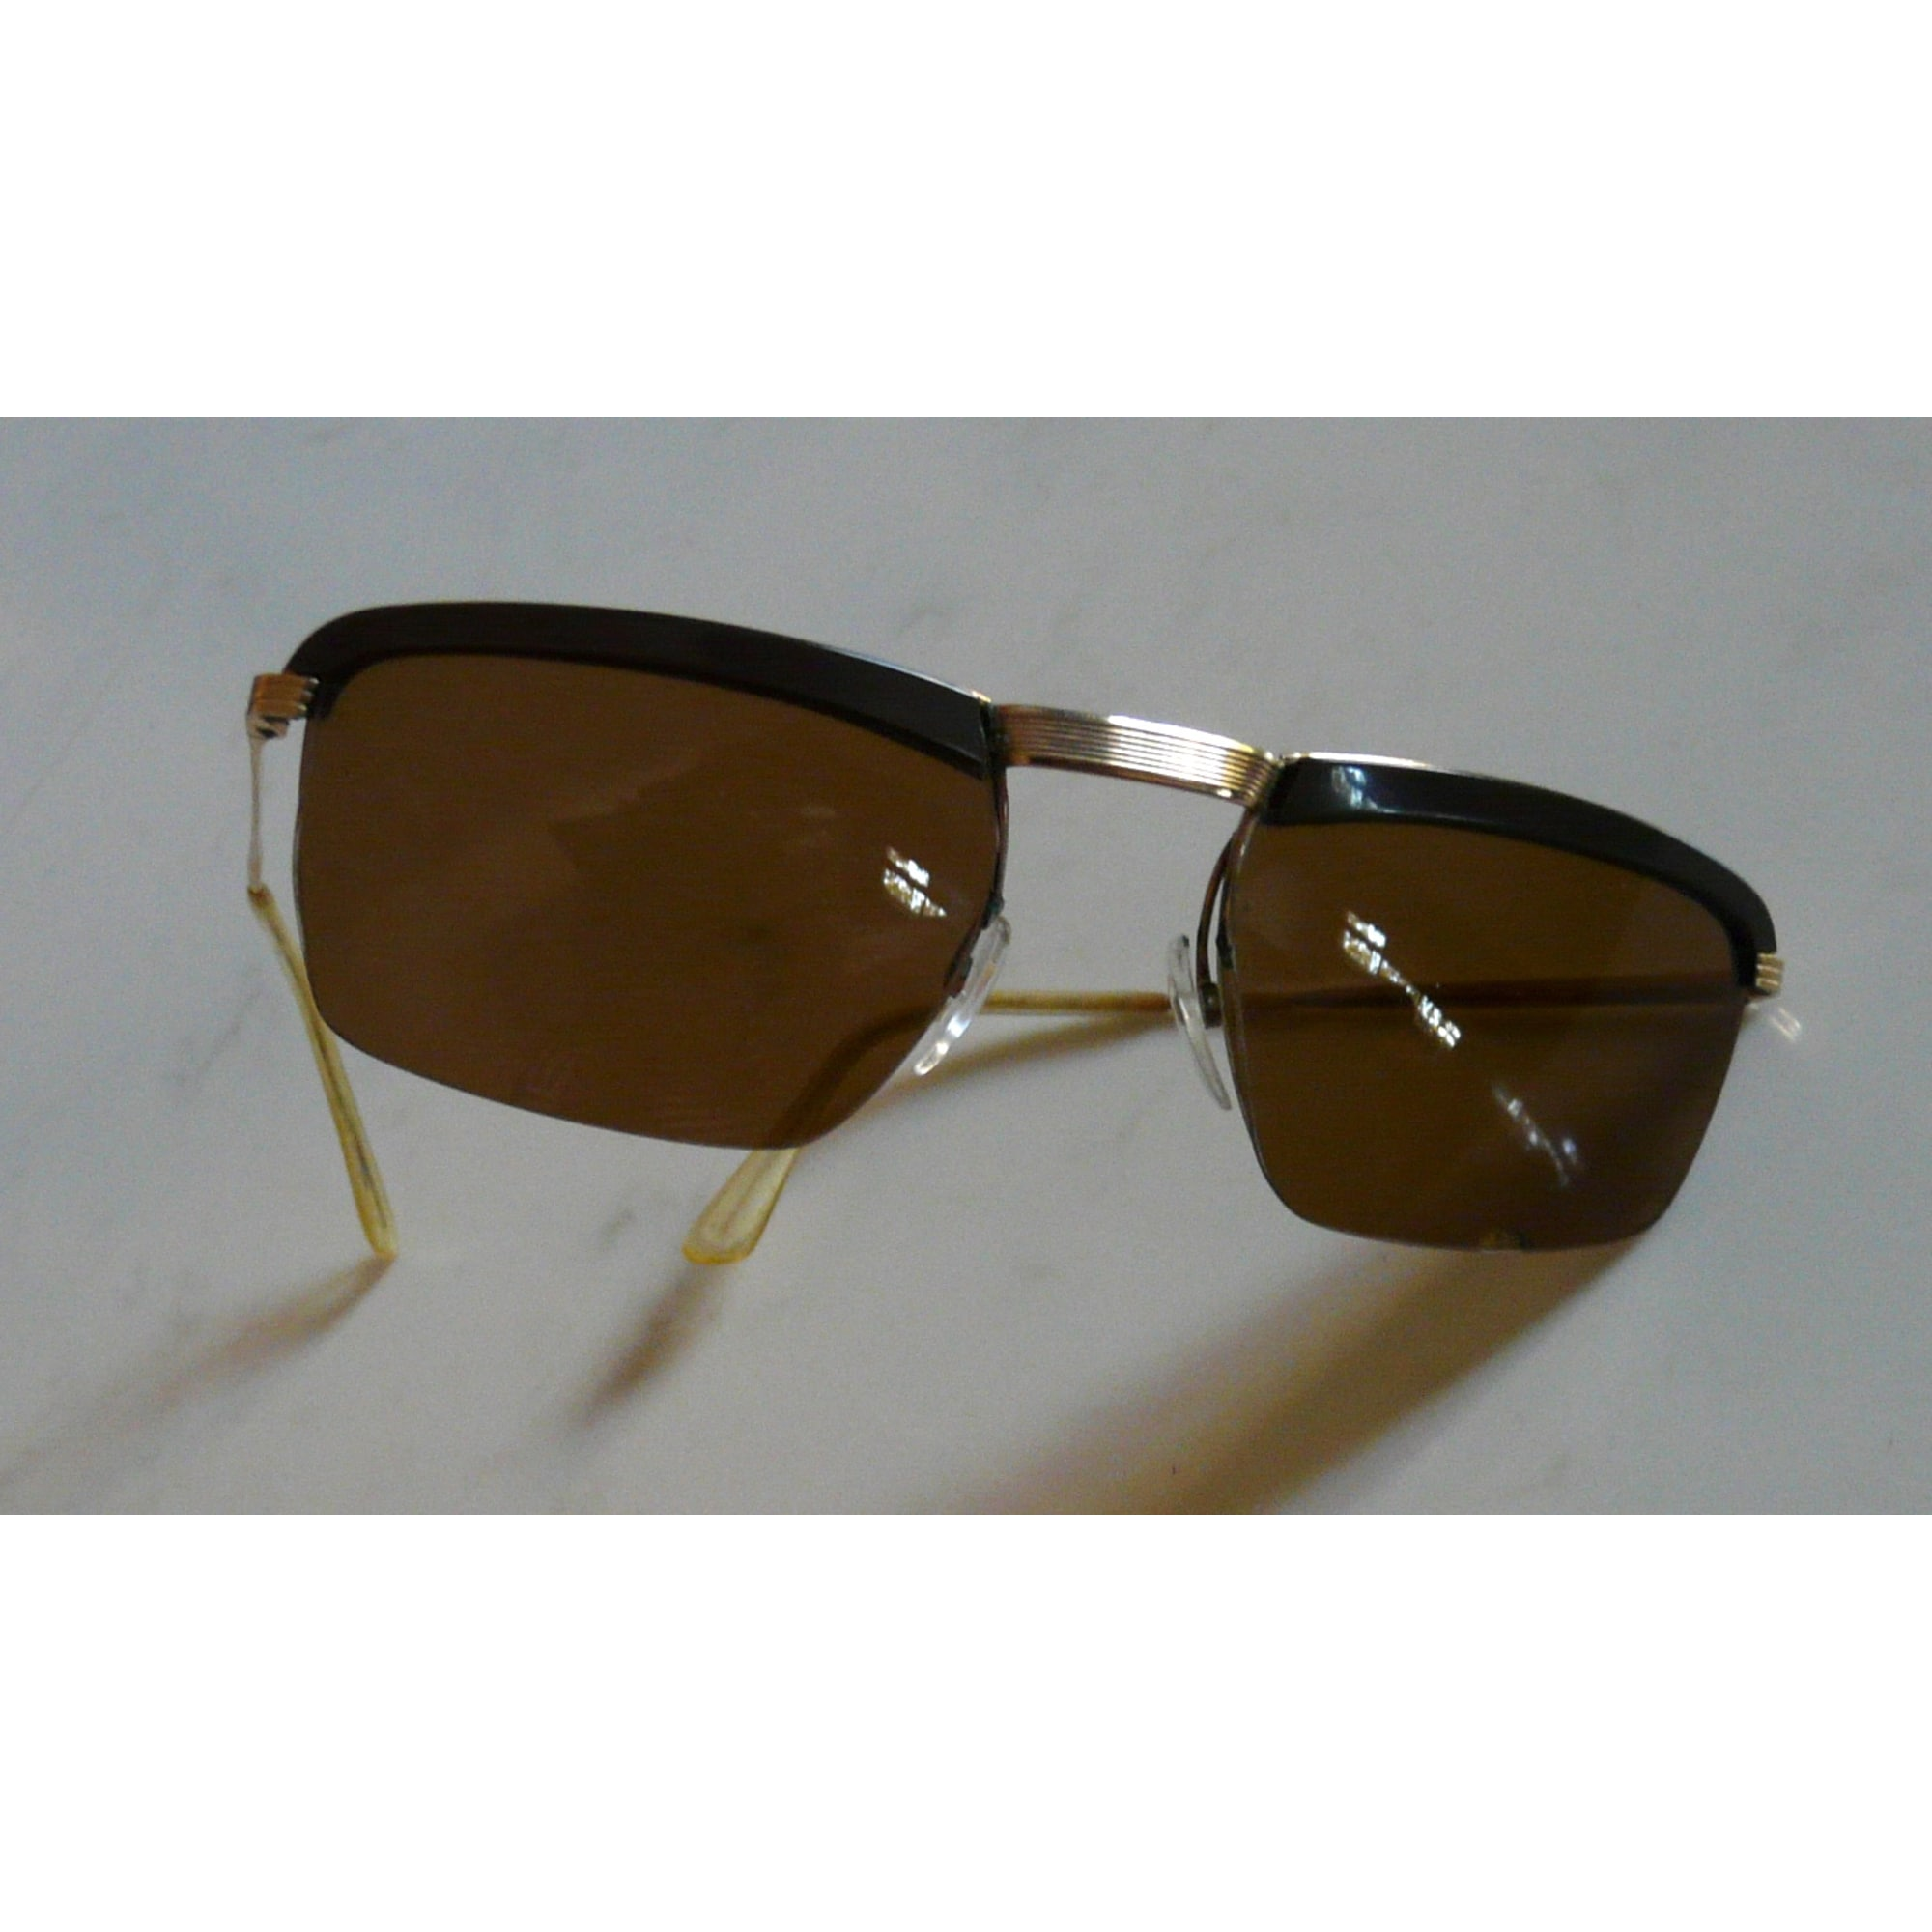 Eyeglass Frames NYLOR Golden, bronze, copper